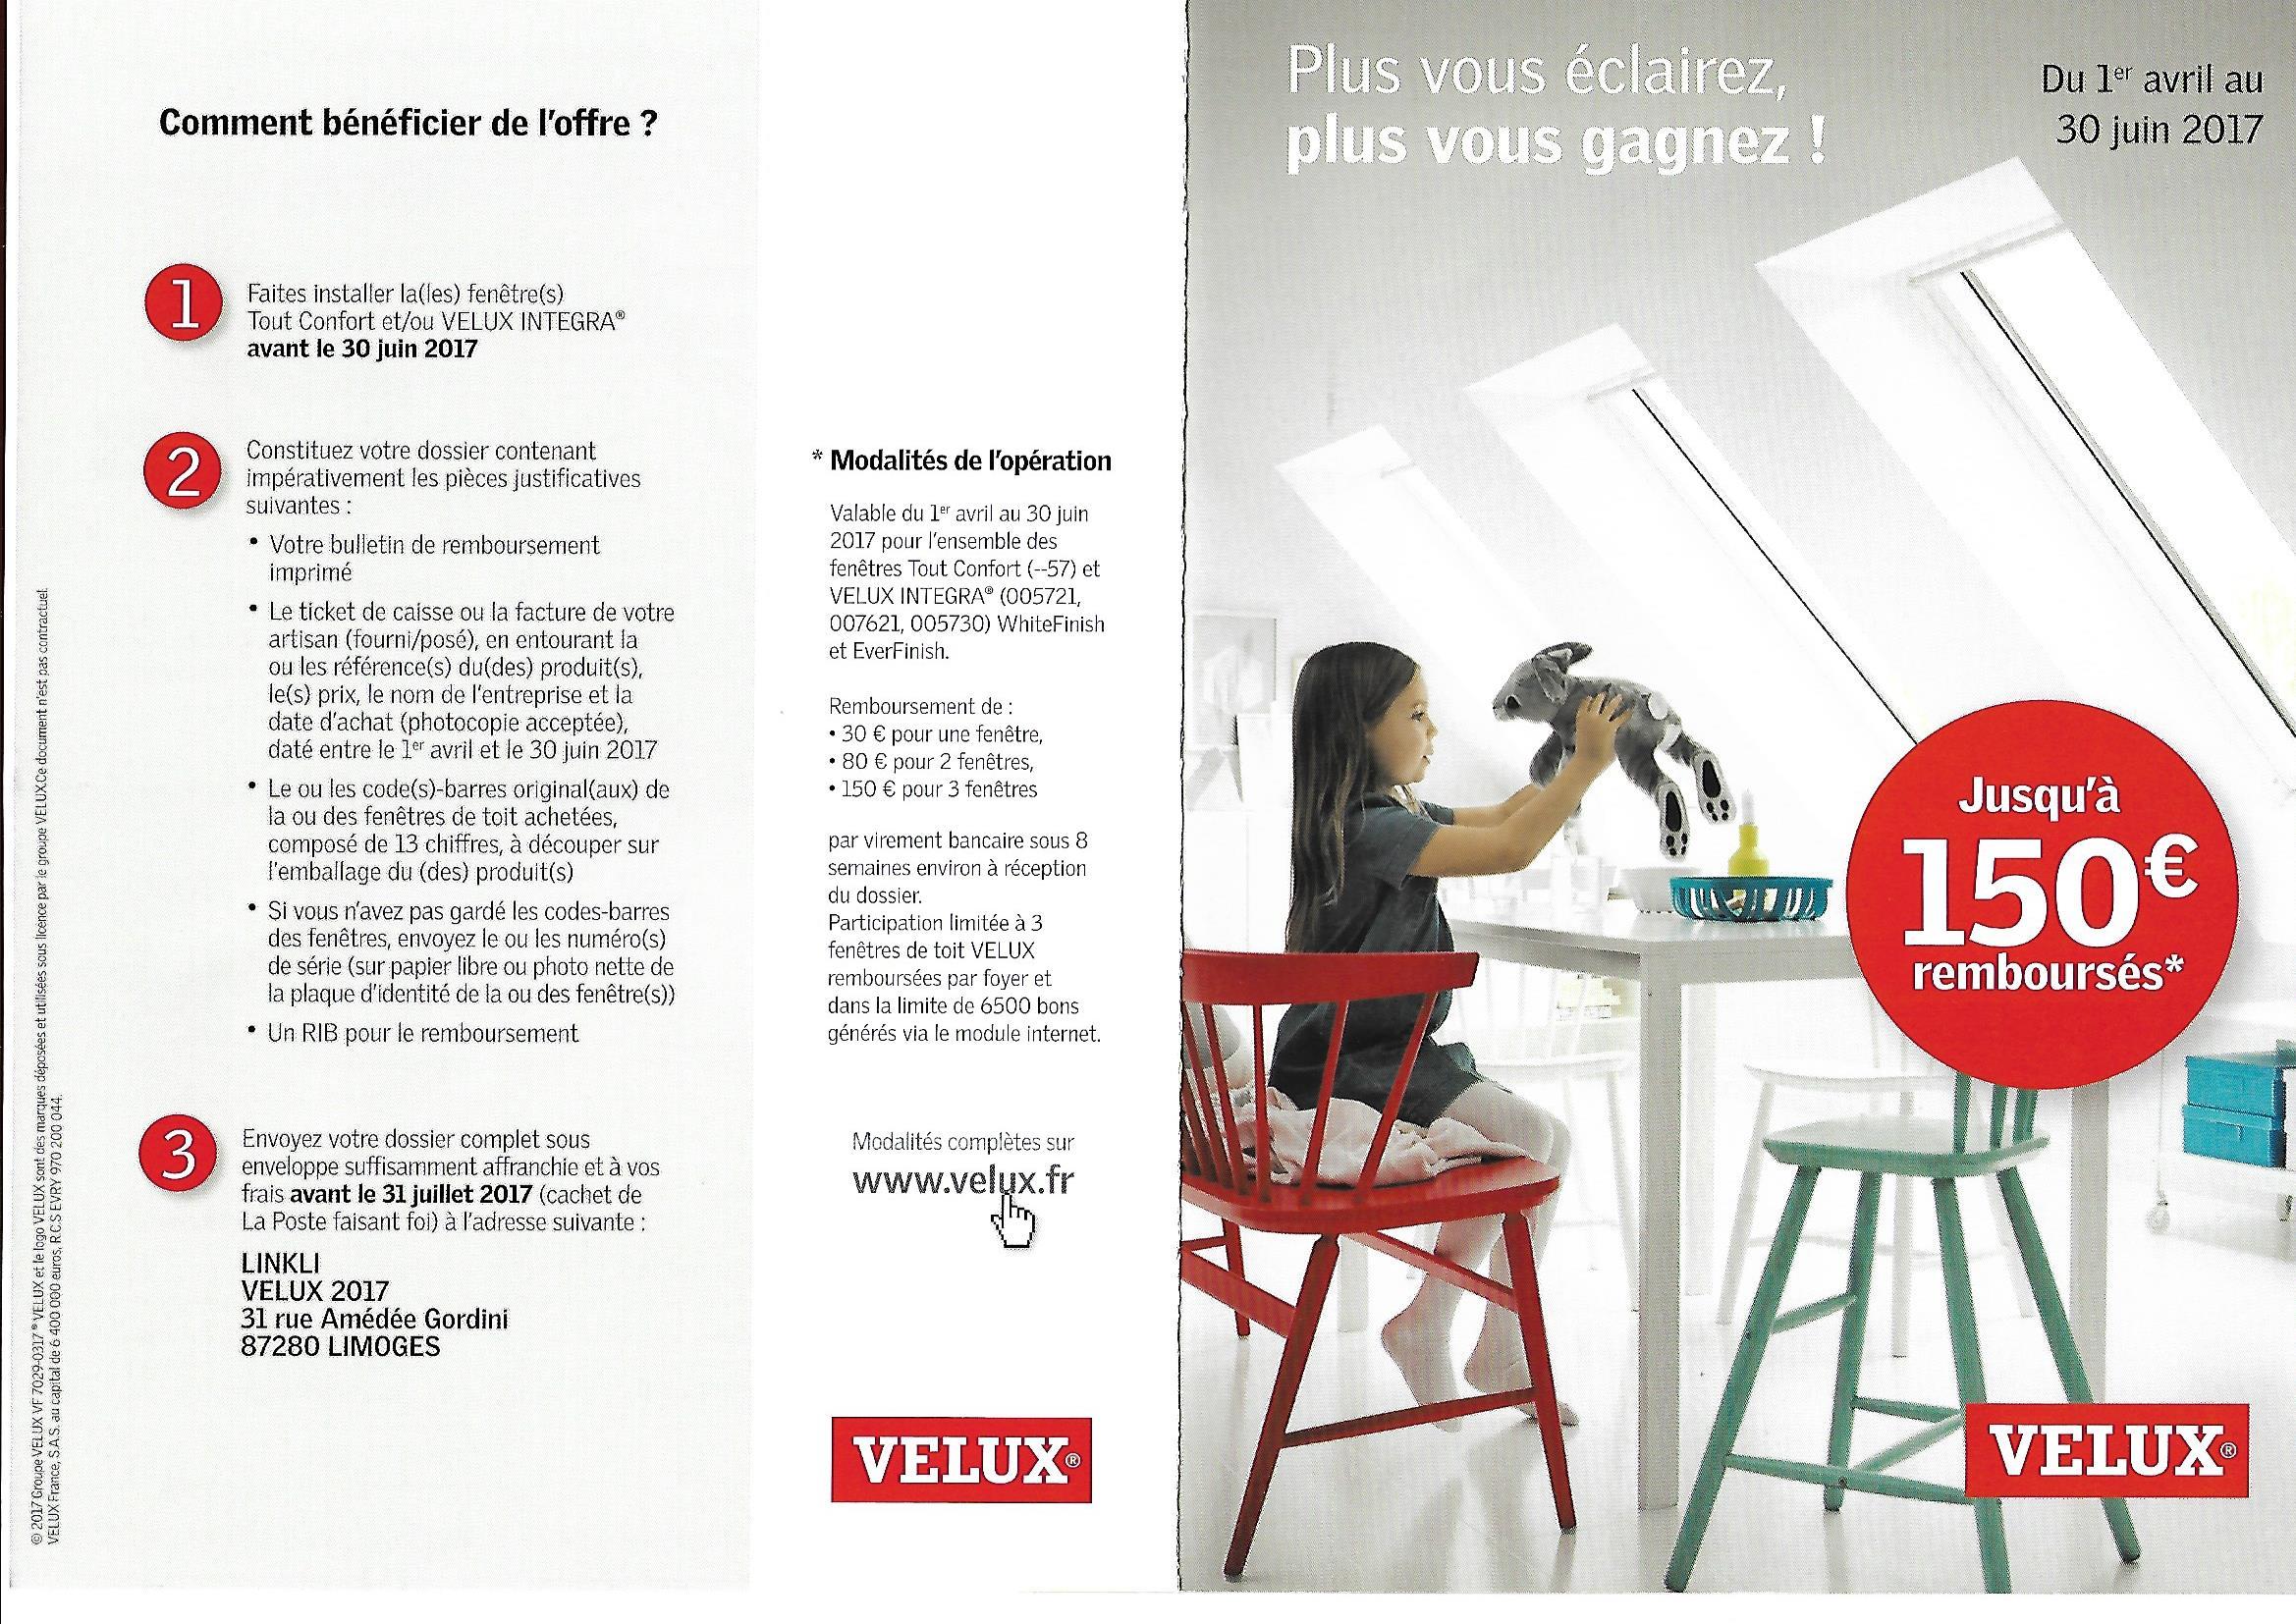 Promo Velux